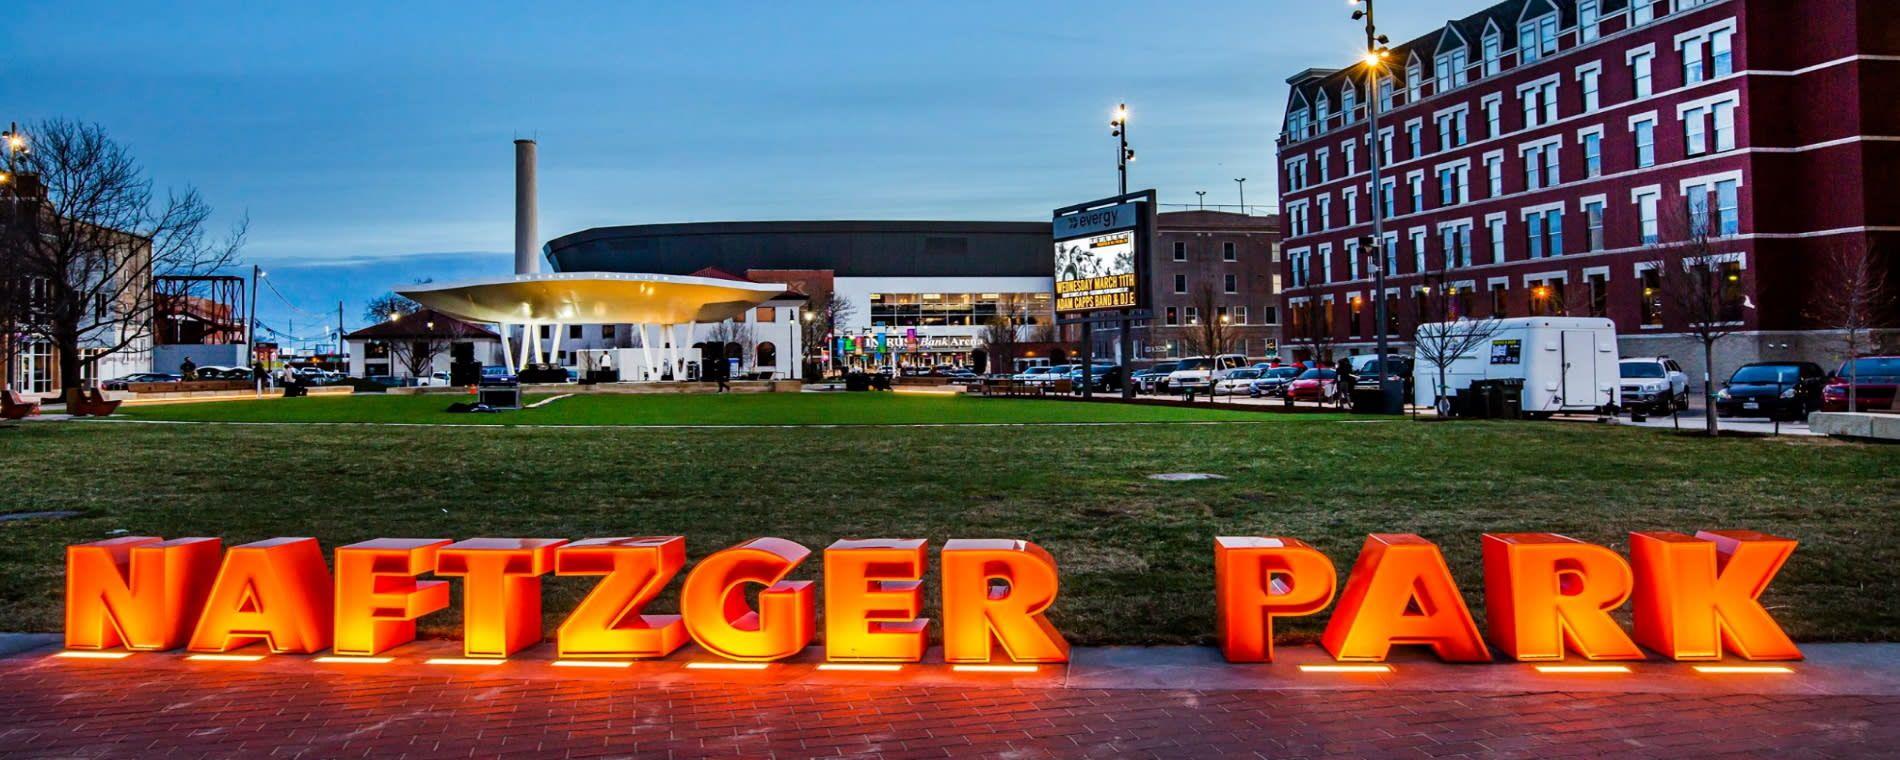 Wave-Nafgtzer-Park-partner-provided-Visit-Wichita